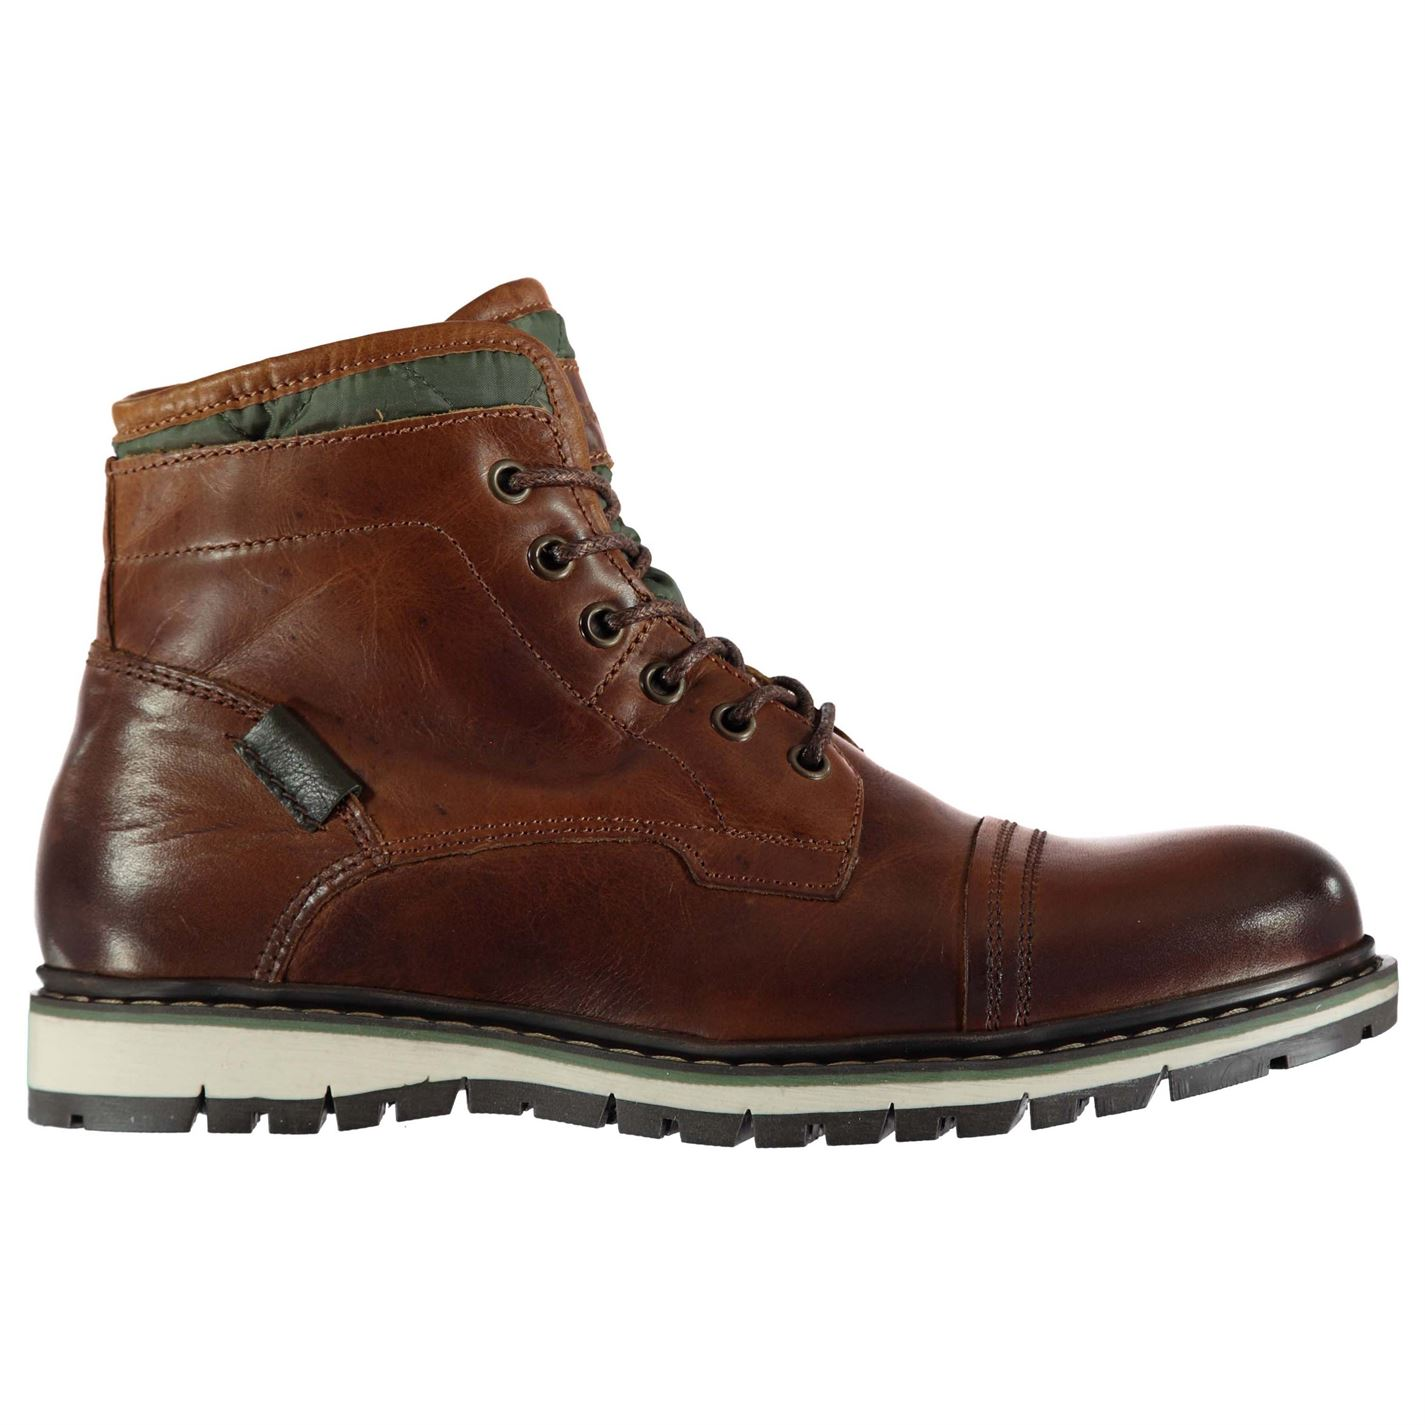 Firetrap Aubin Mess Boots Mens Camel - Glami.cz a0cc74353d